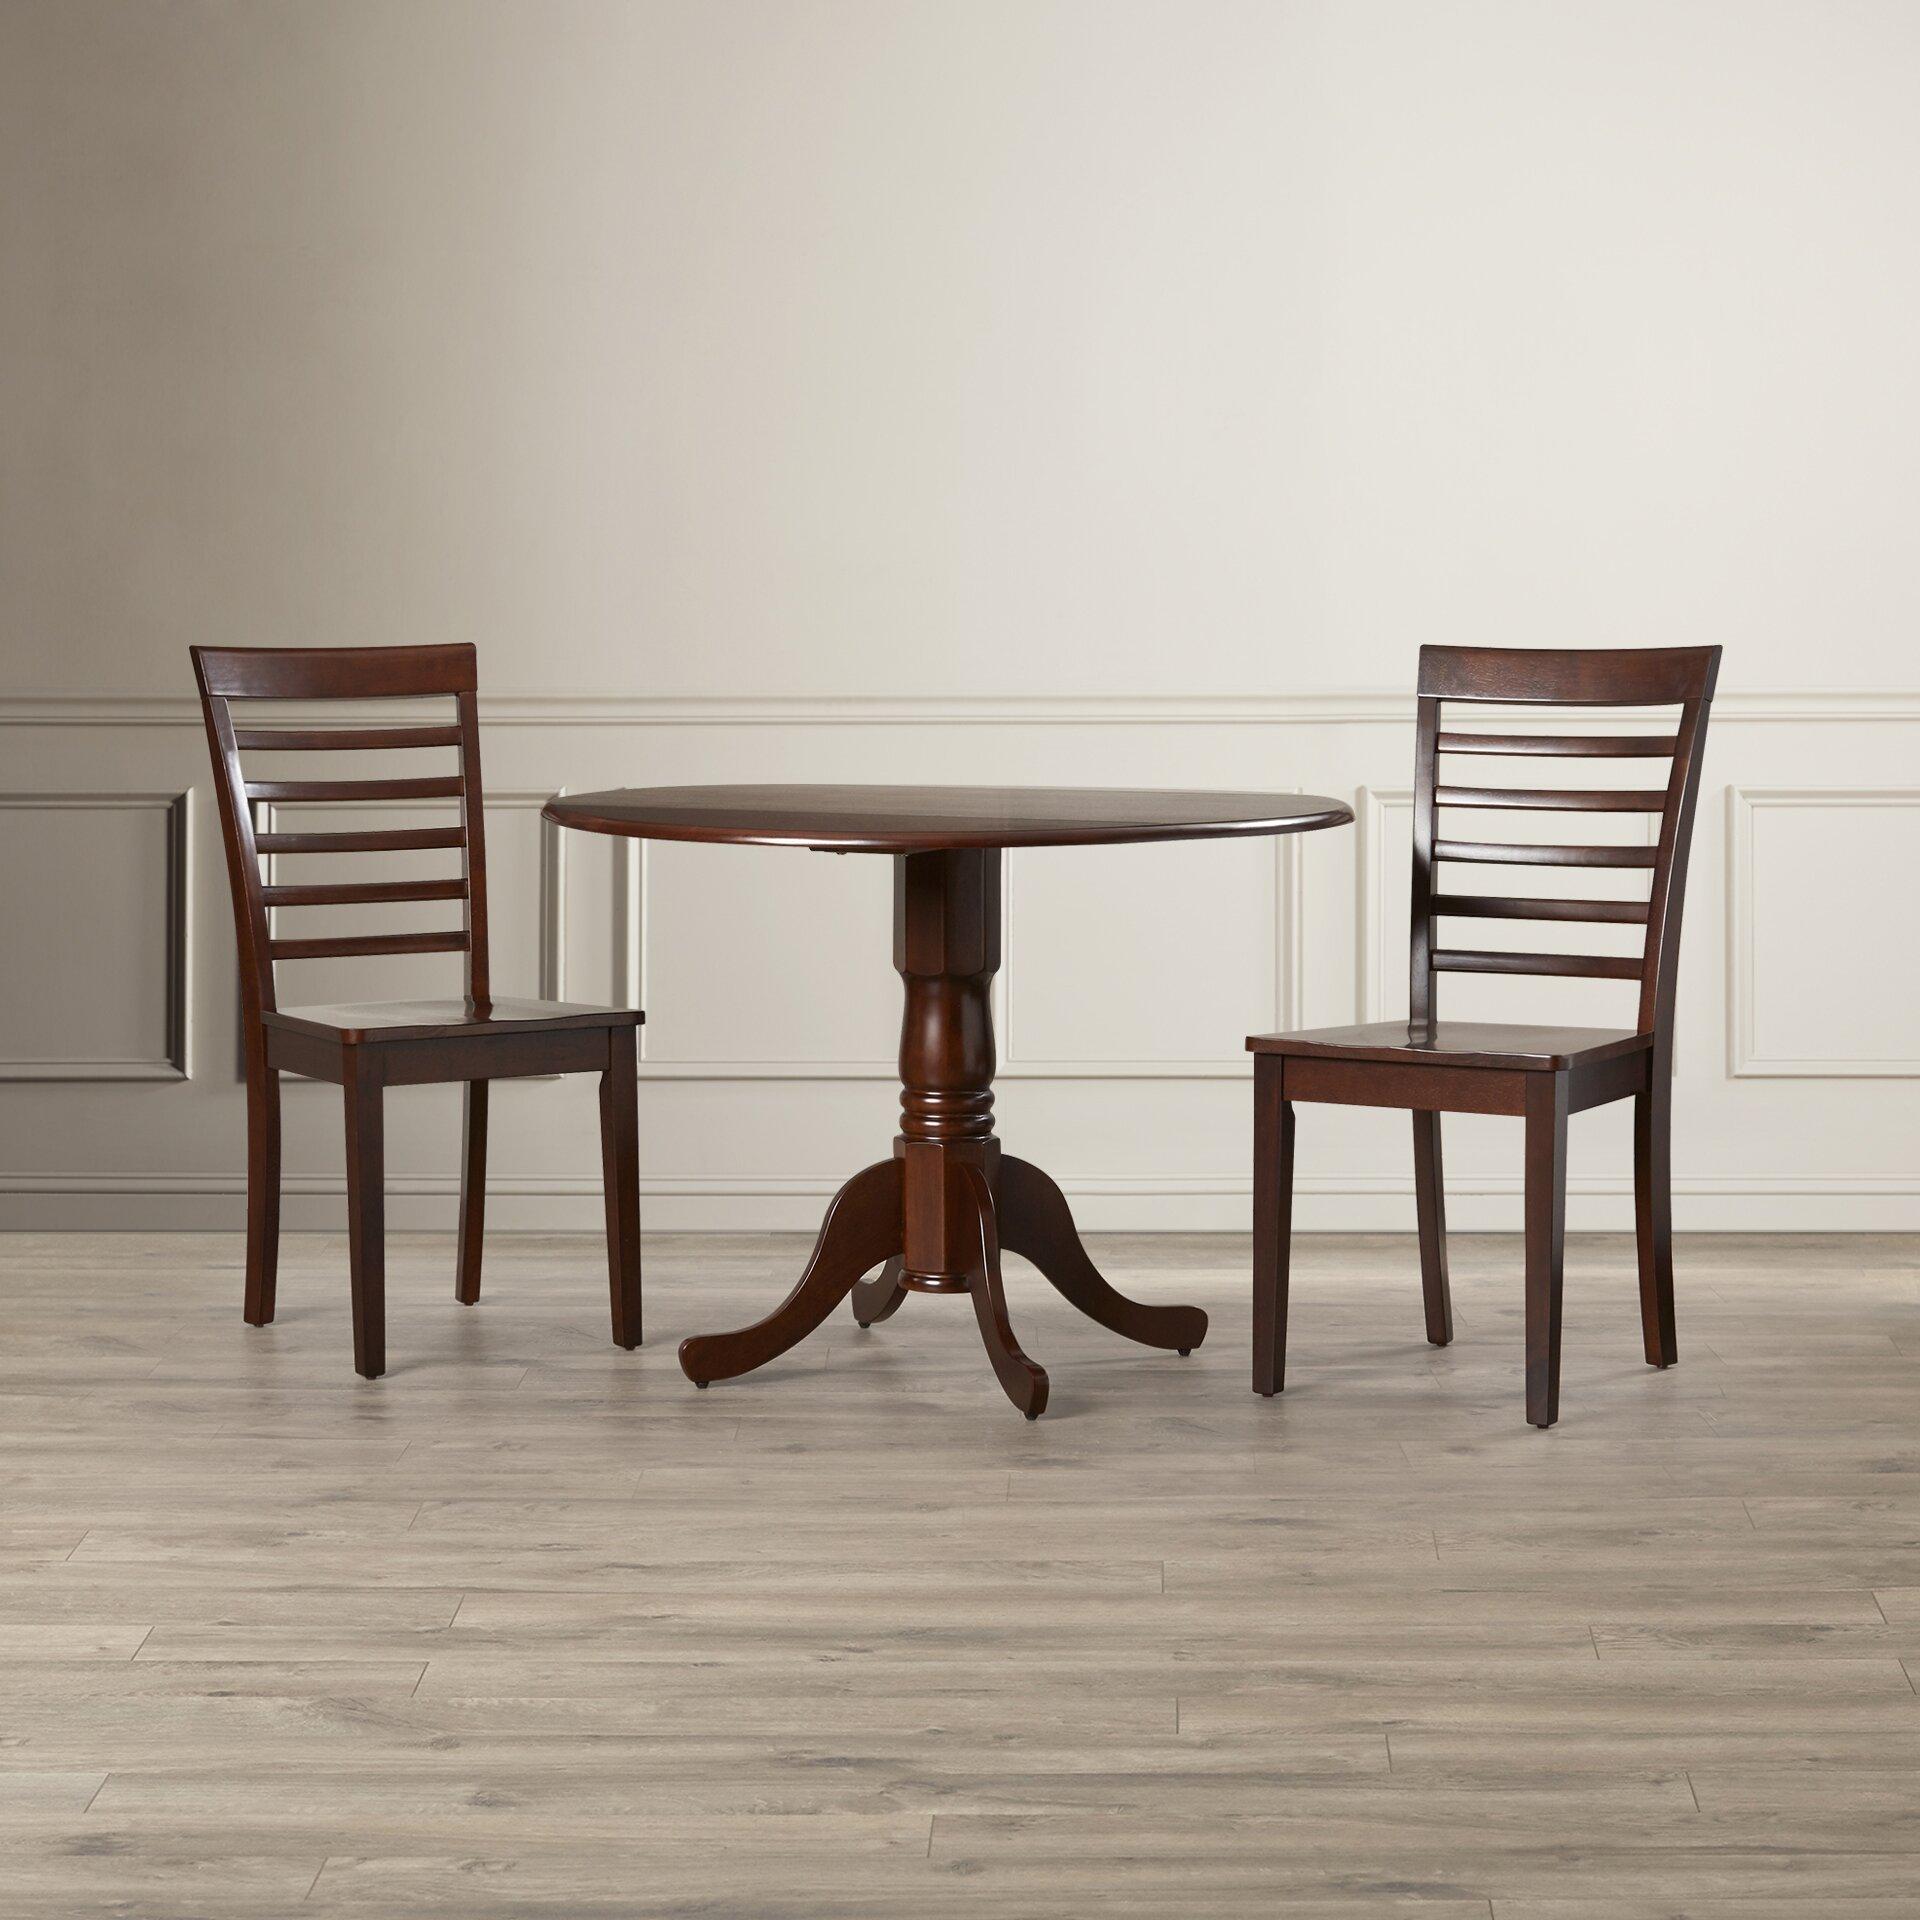 charlton home gloucester 3 piece dining set reviews wayfair. Black Bedroom Furniture Sets. Home Design Ideas